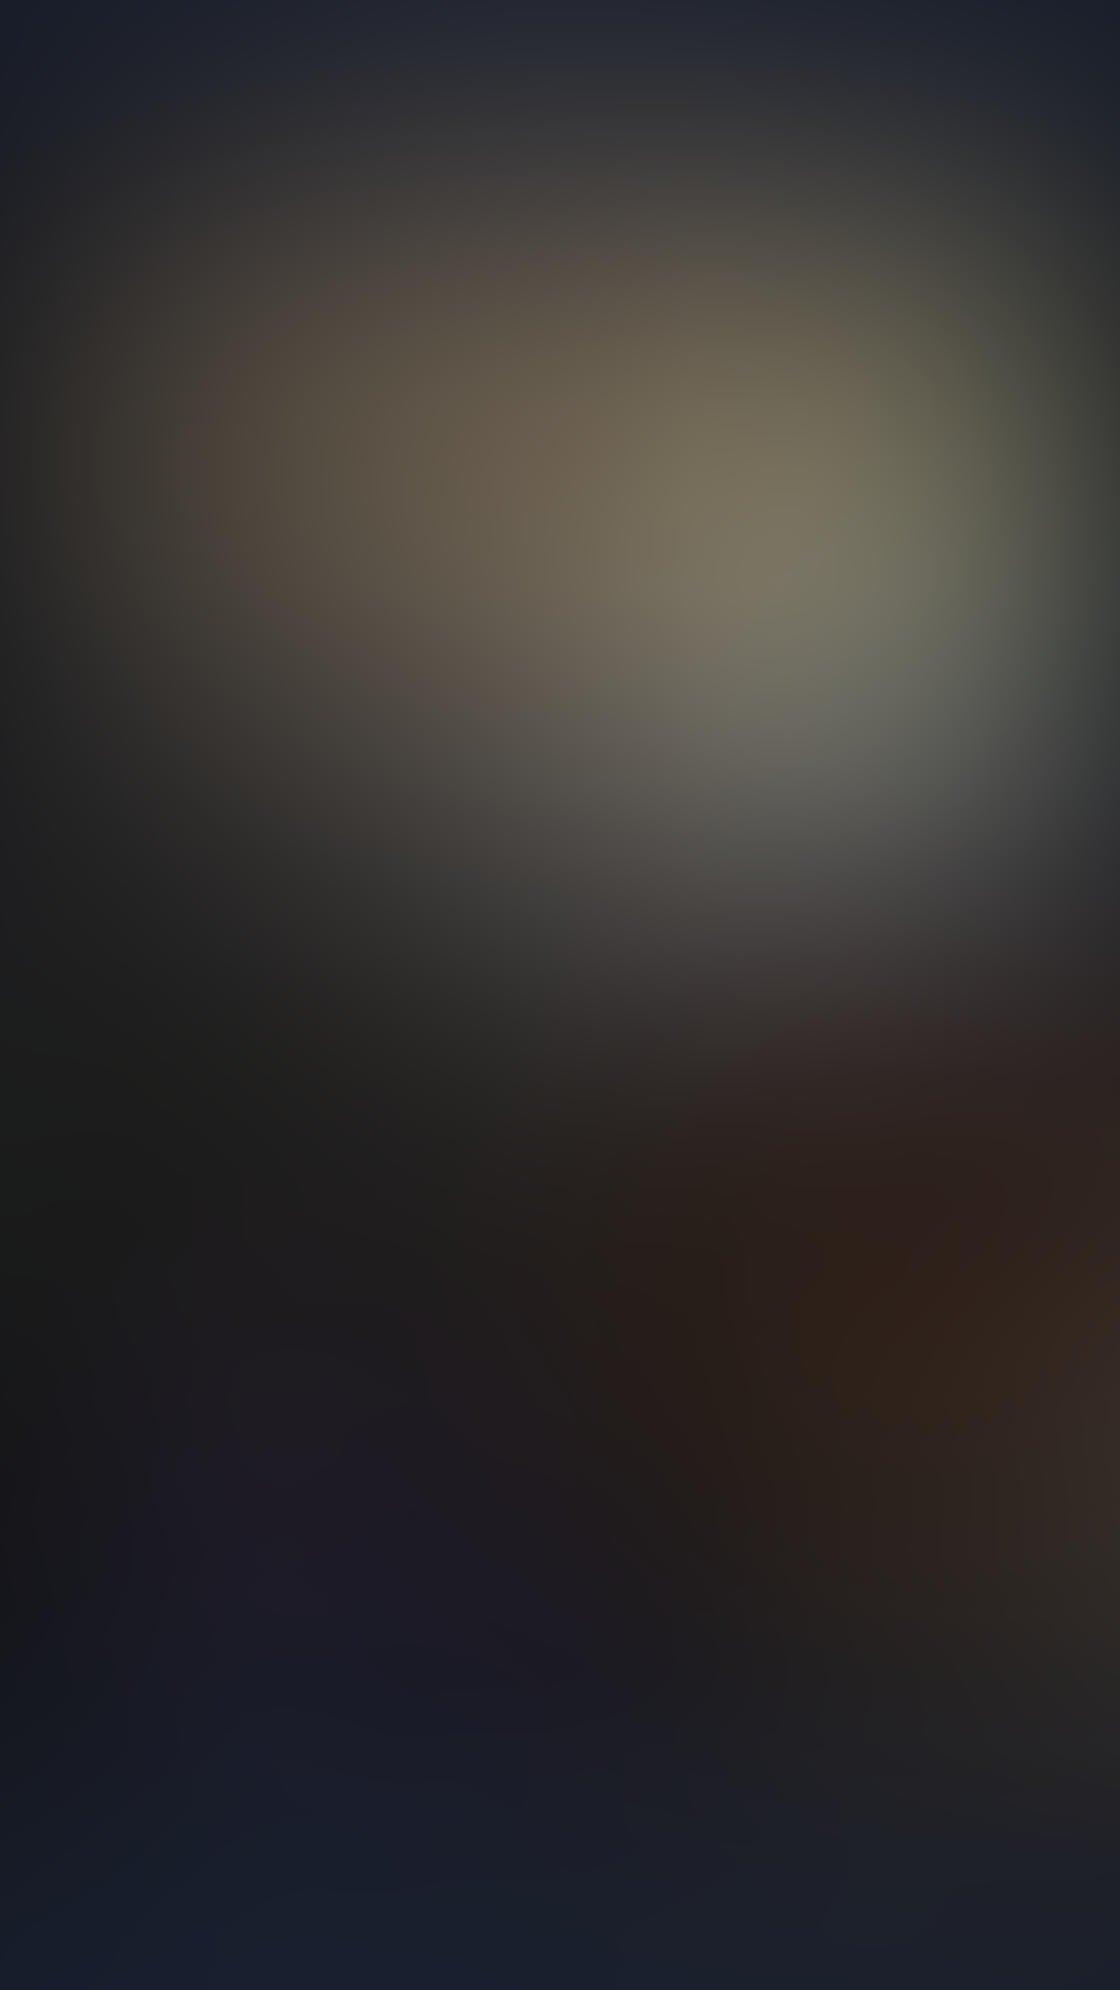 Lenslight iPhone Photo App 24